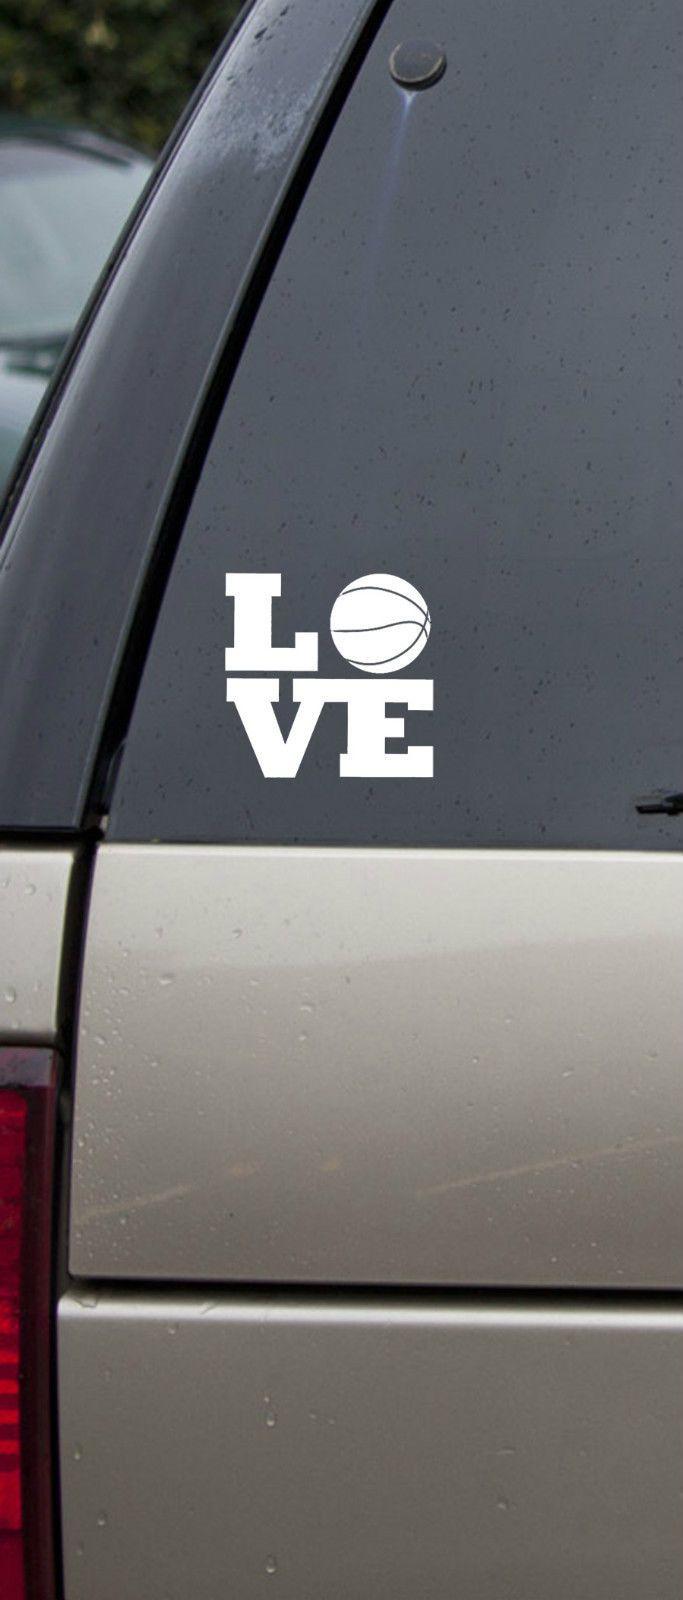 Basketball Love Vinyl Decal Car Sticker Car Decals Vinyl Vinyl Decals Car Stickers [ 1600 x 683 Pixel ]